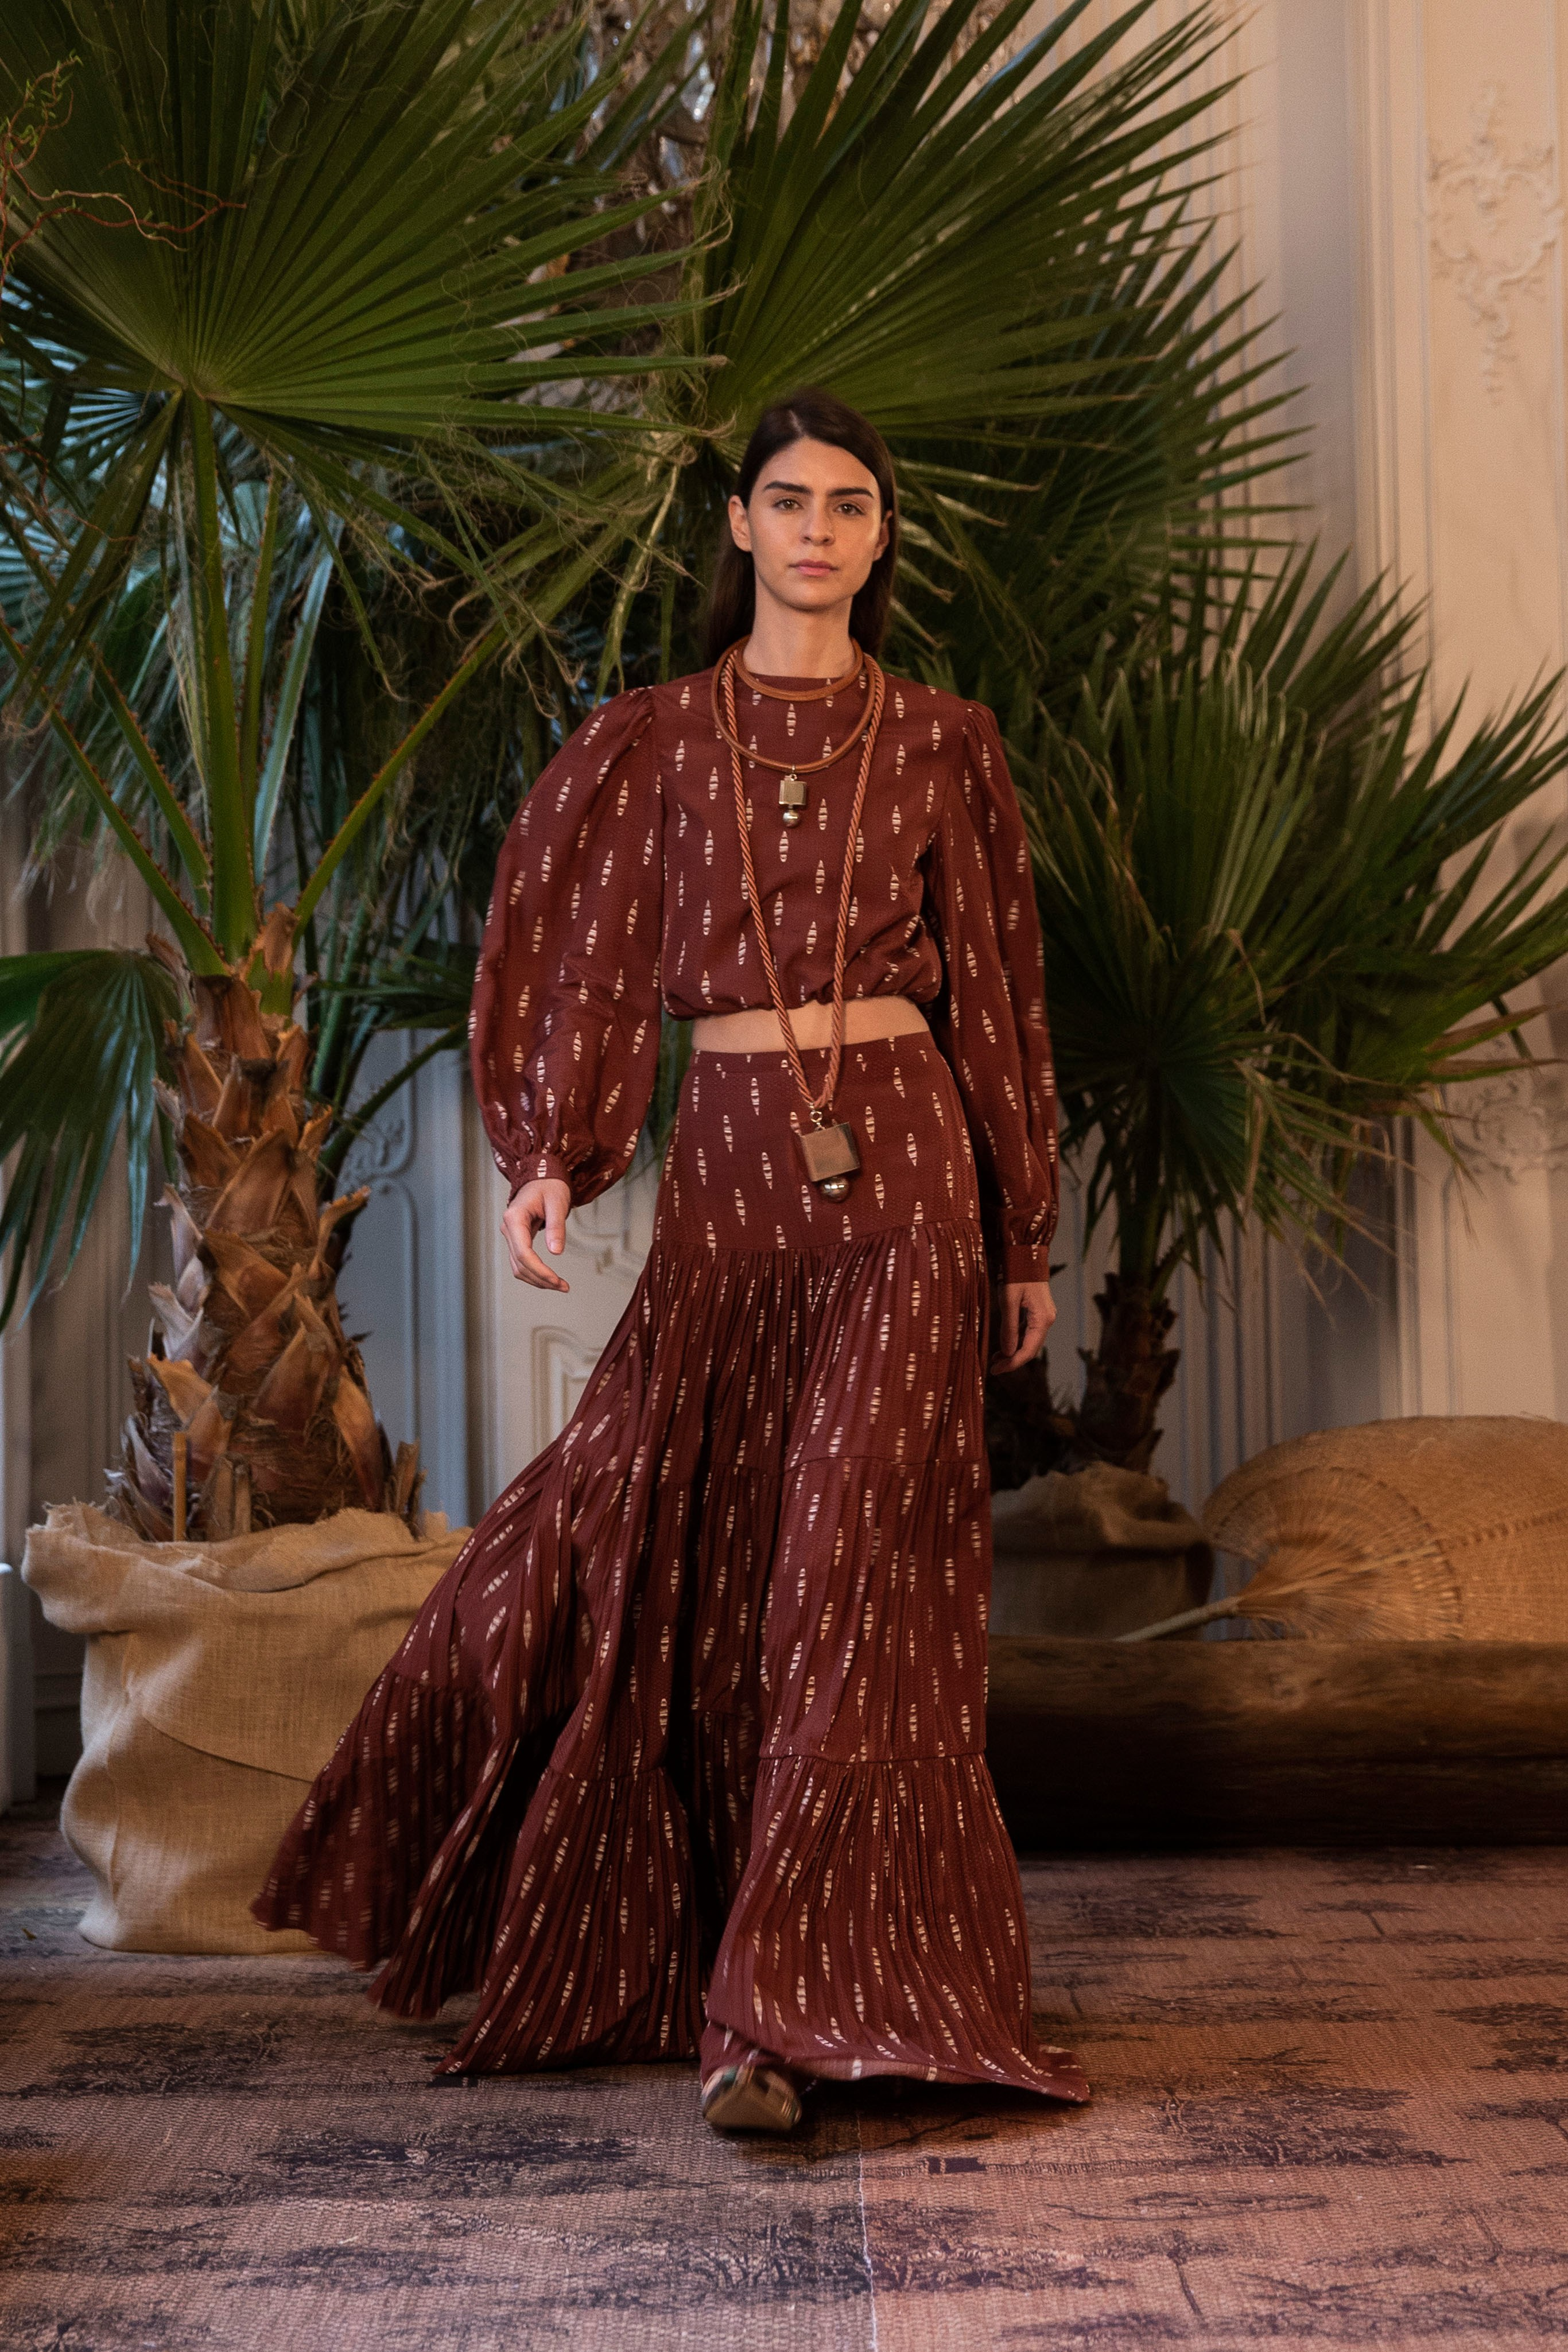 00025-johanna-ortiz-fall-2019-ready-to-wear